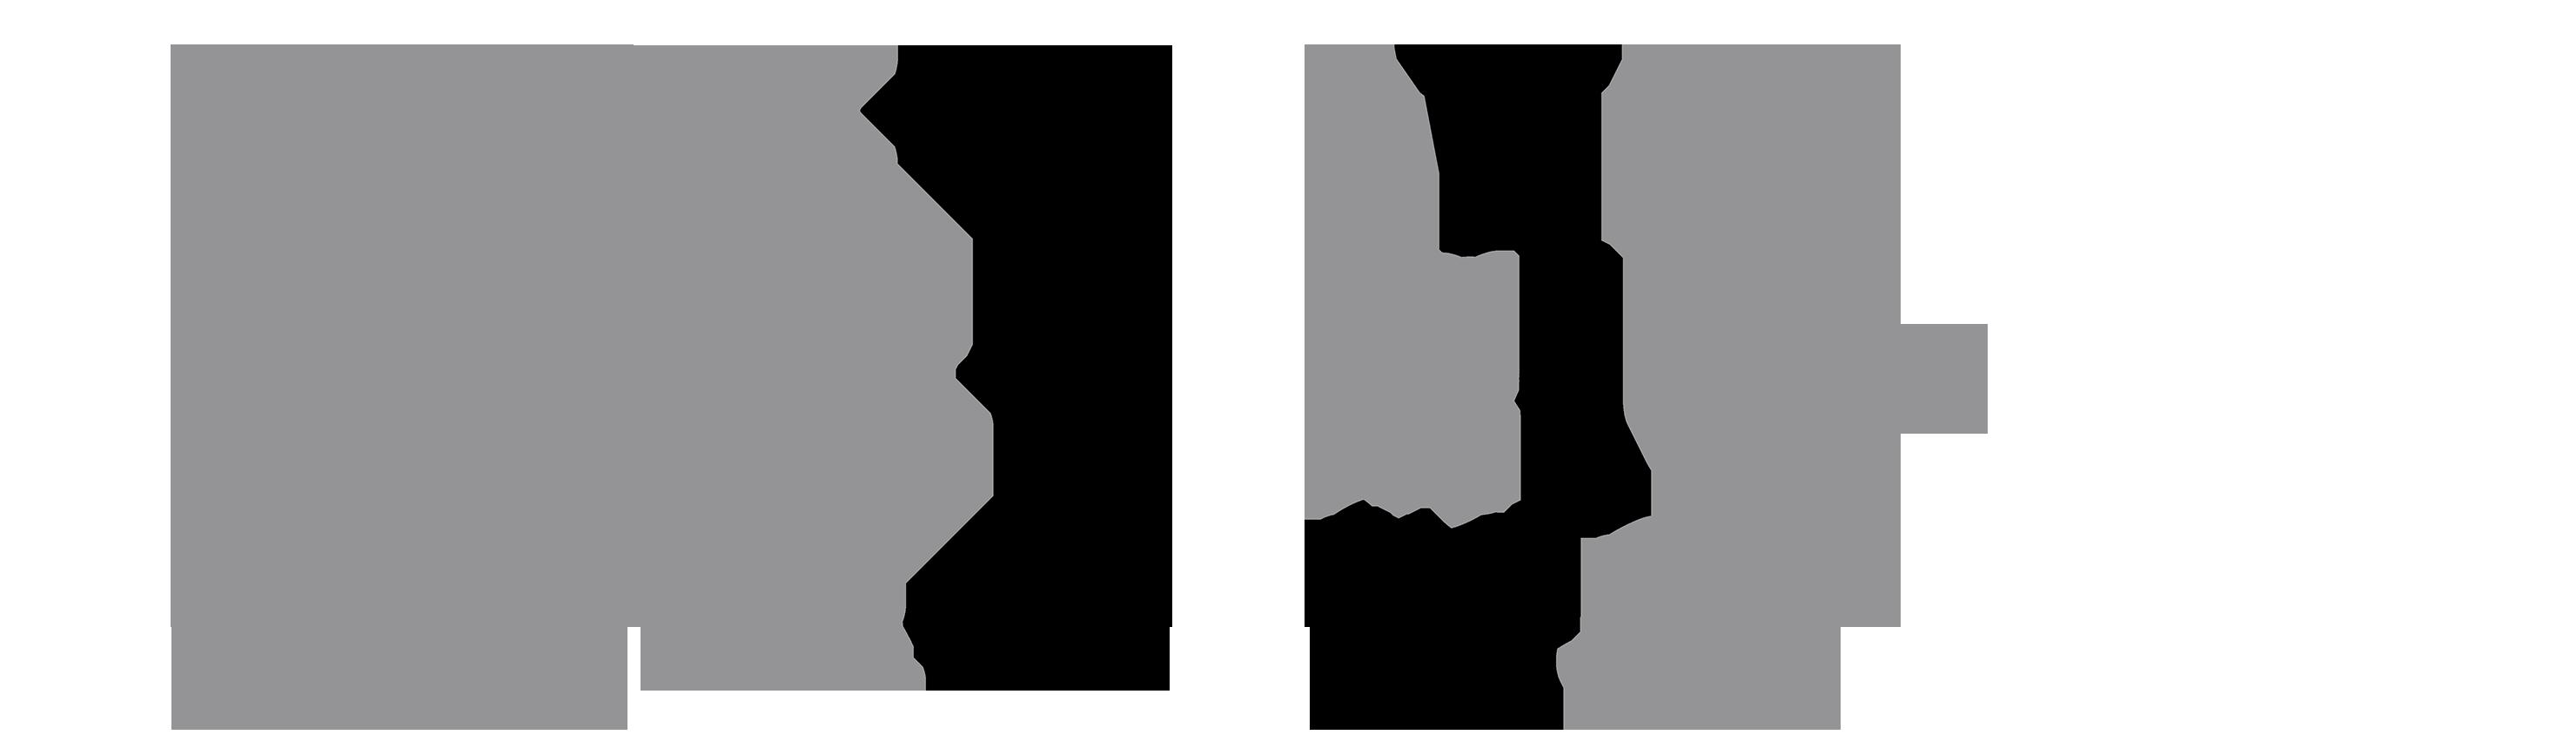 Typeface-Heimat-Sans-F05-Atlas-Font-Foundry